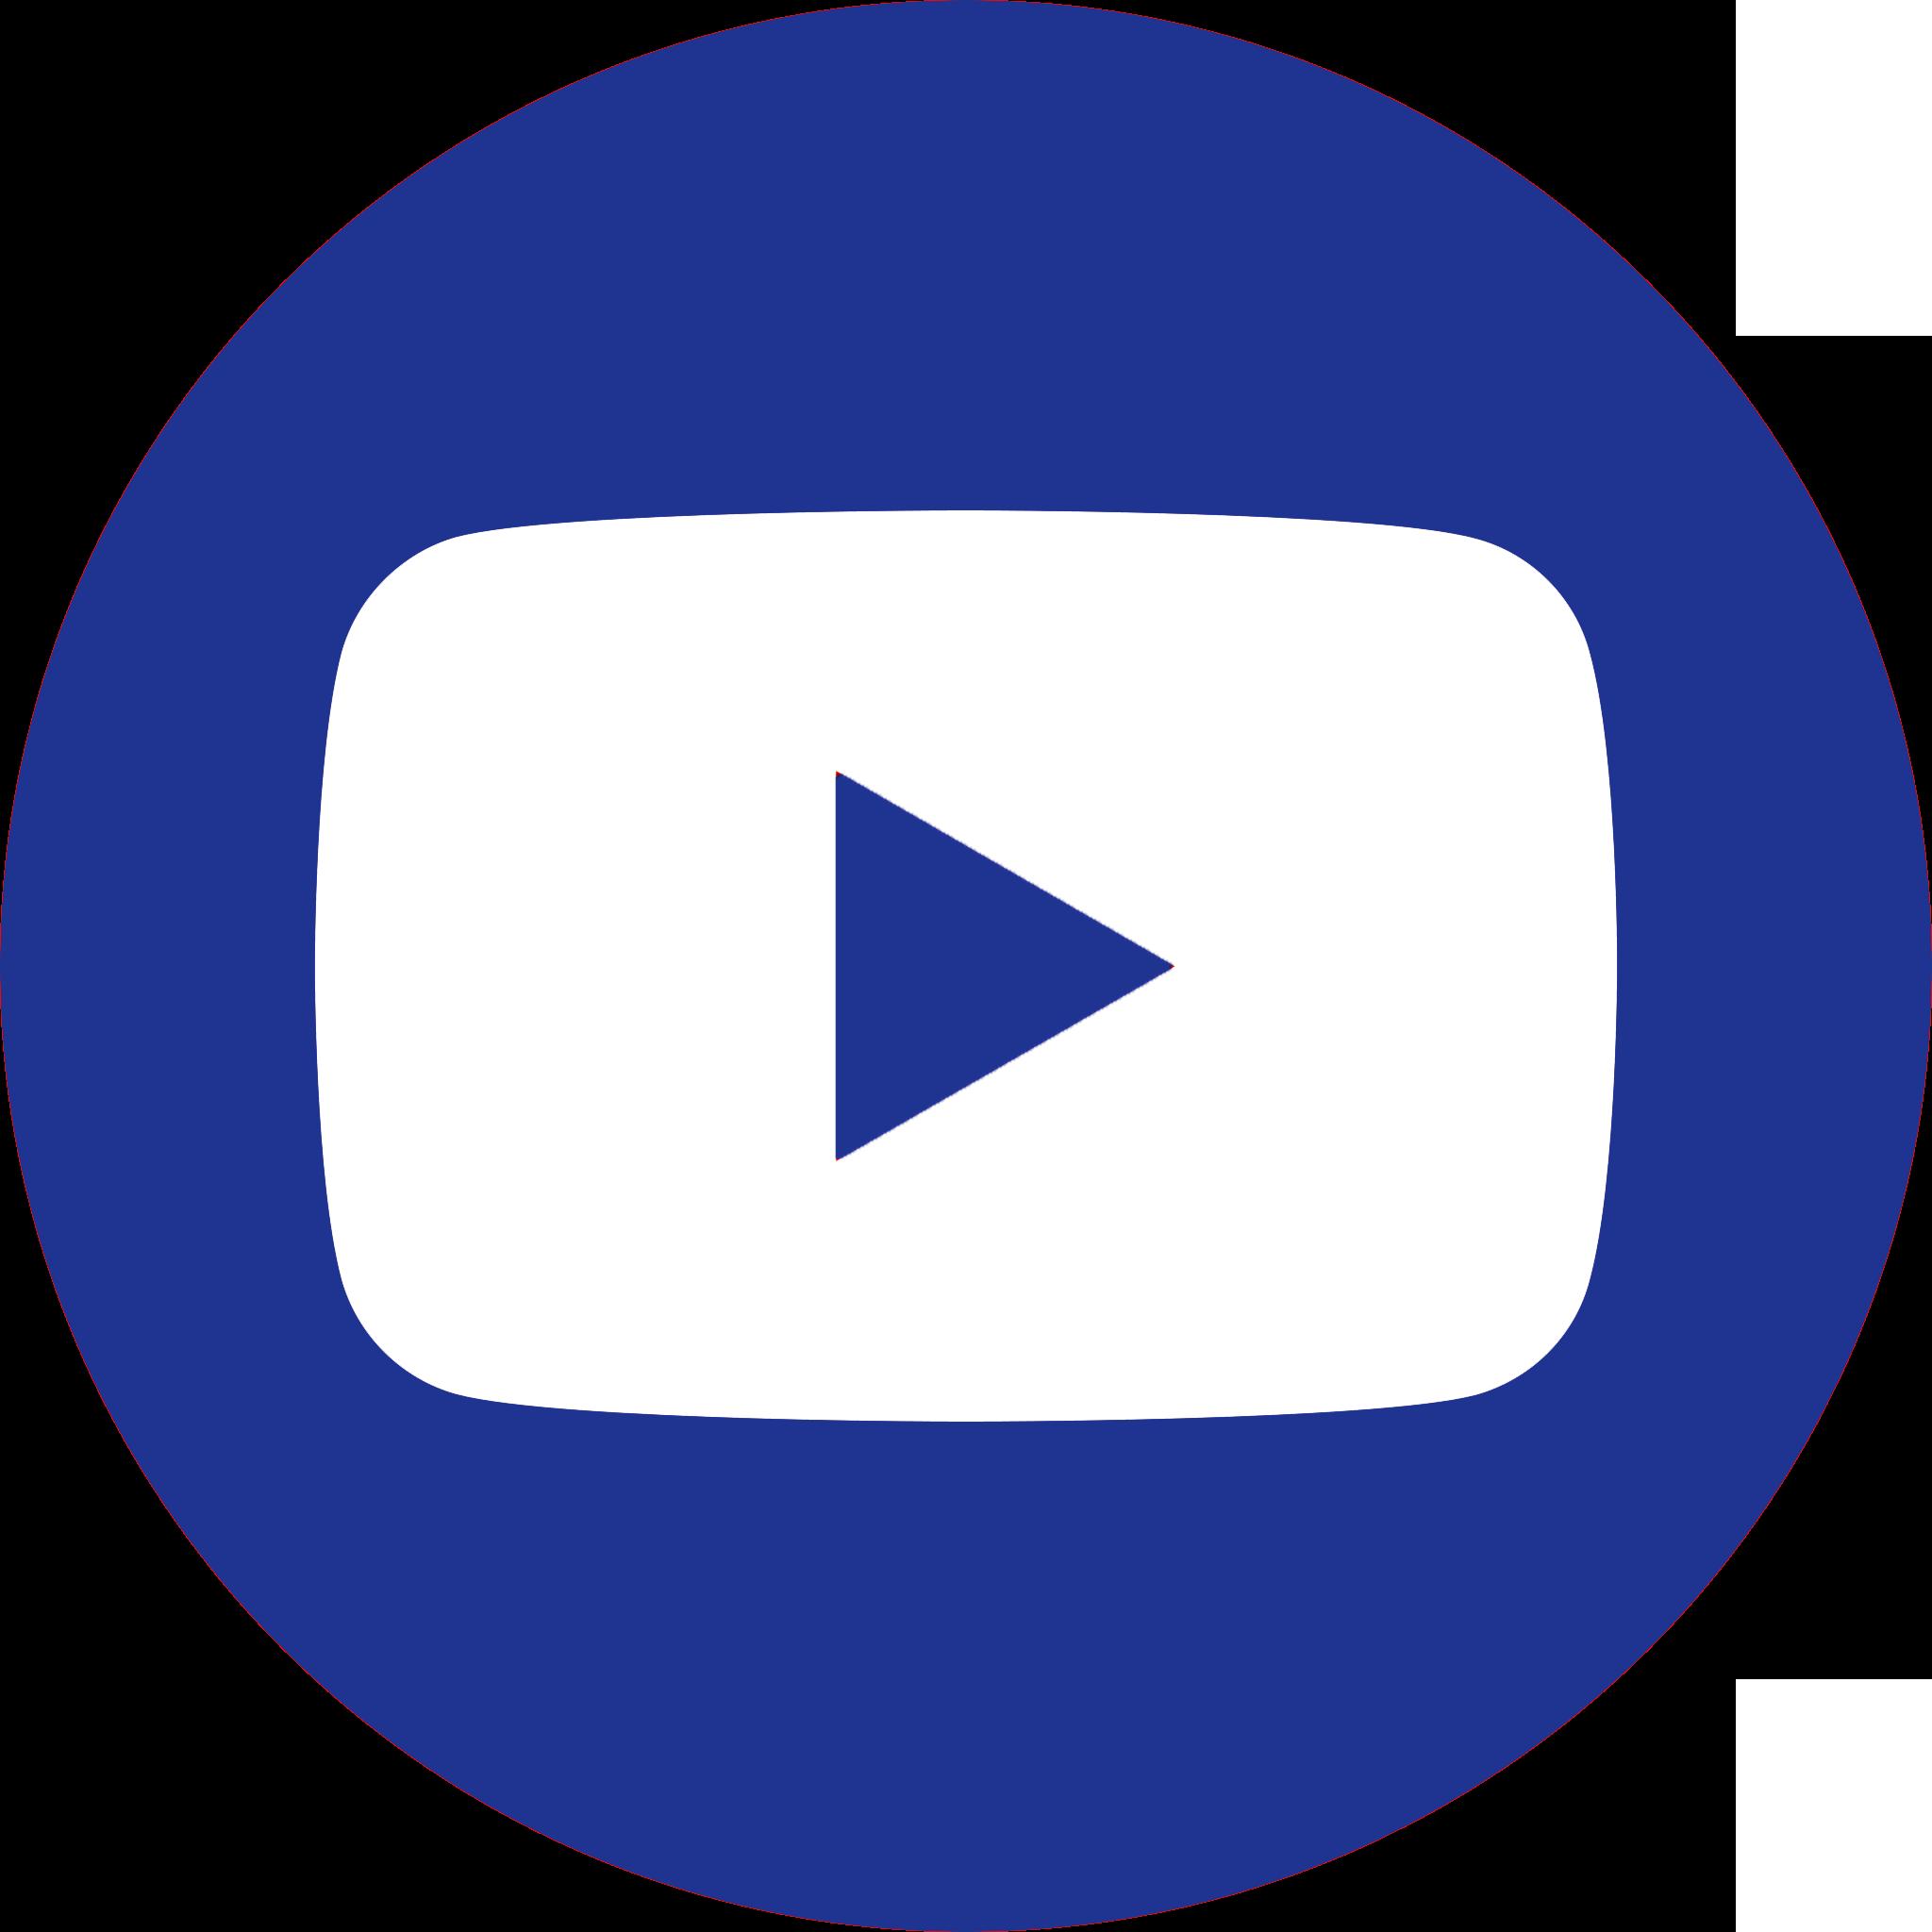 YouTube bleu